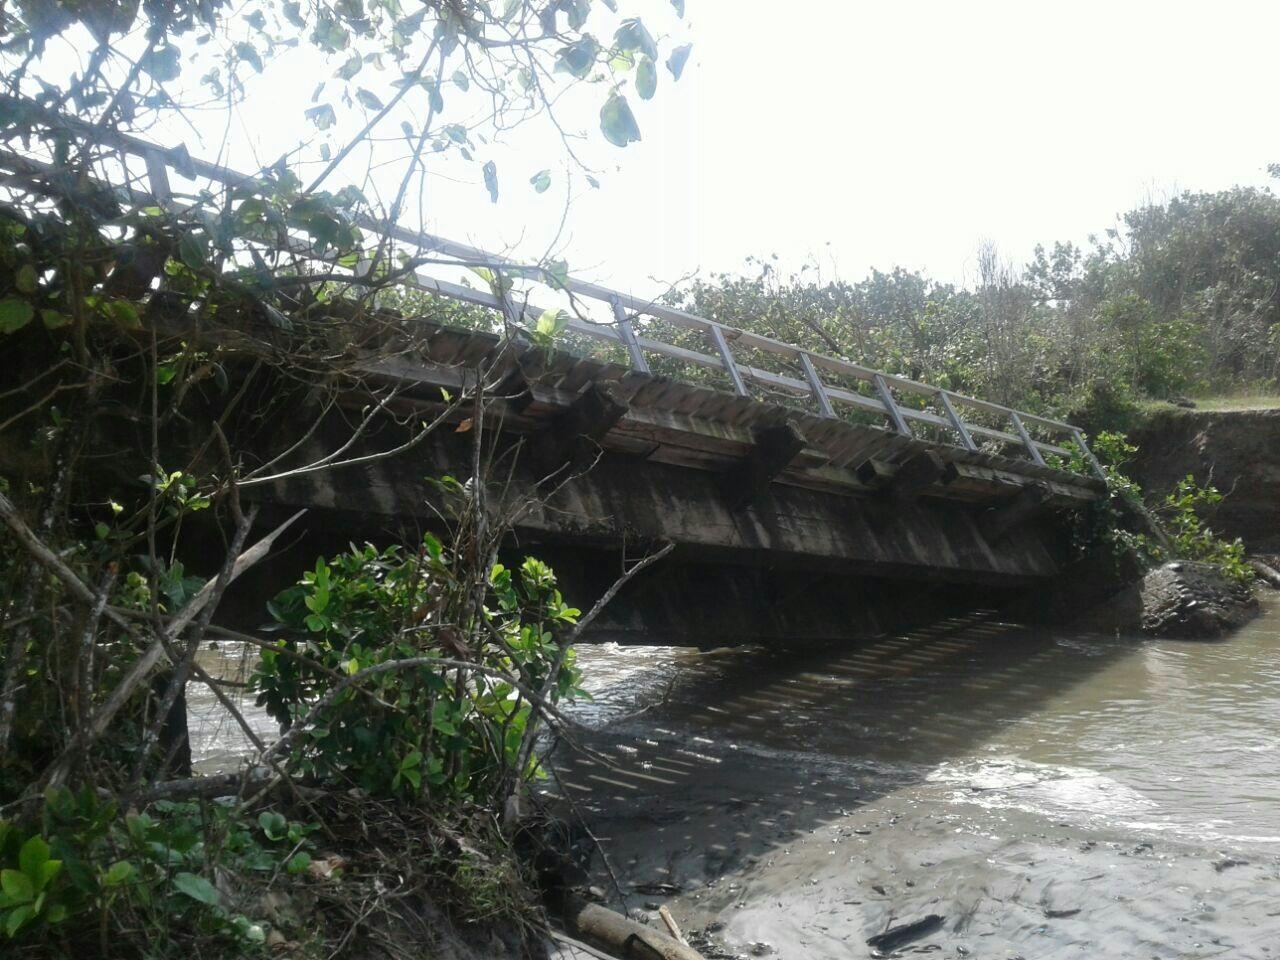 Jembatan di Ipuh, Mukomuko, Bengkulu ambruk akibat banjir (Demon/Okezone)